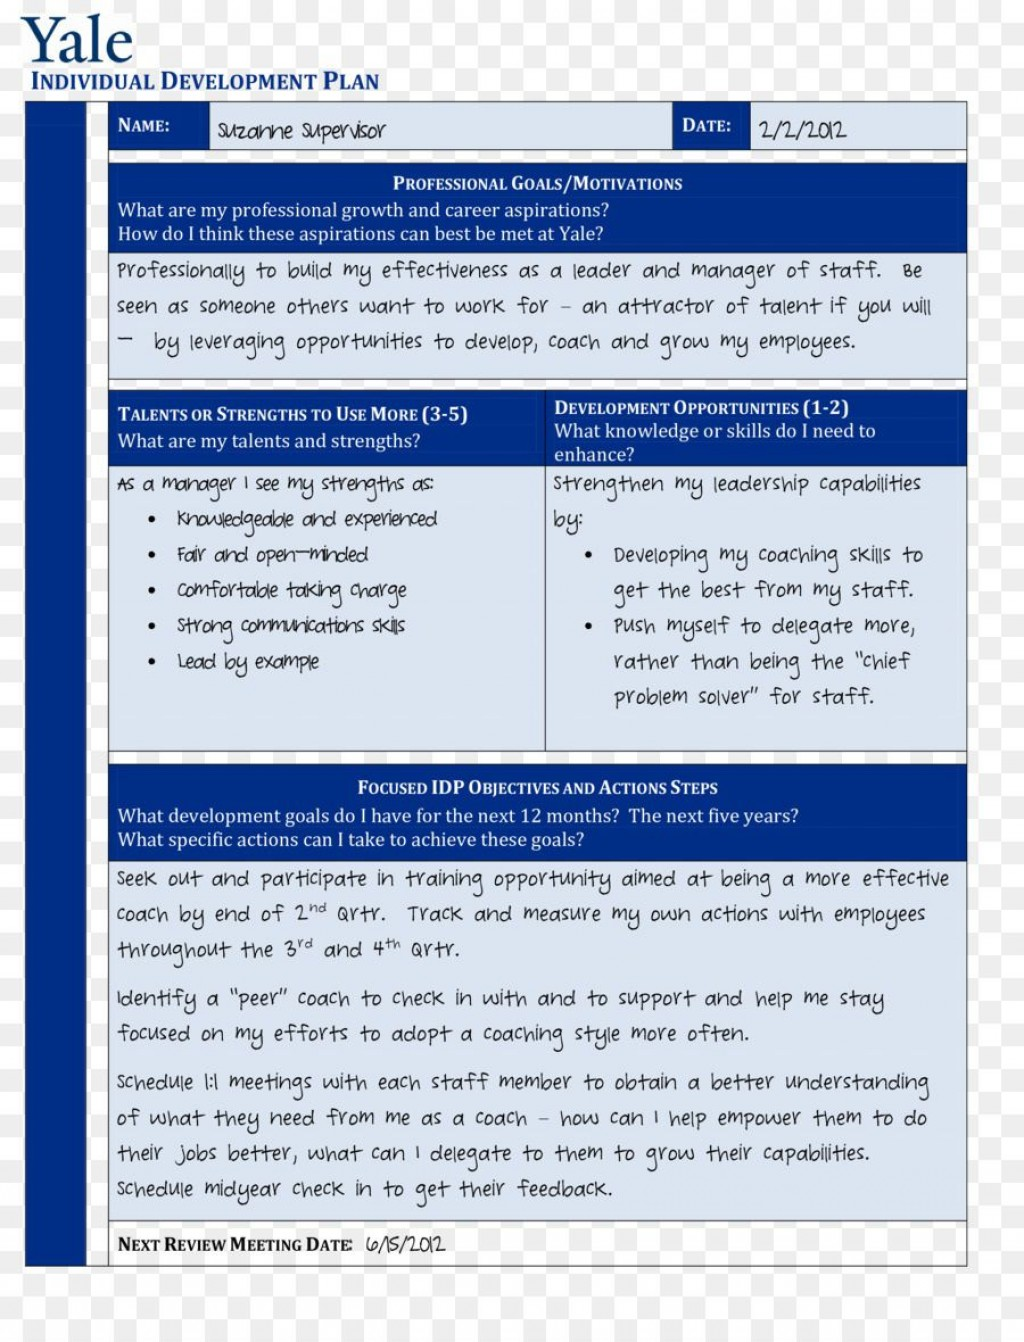 001 Imposing Professional Development Plan Template Pdf Highest Clarity  Sample ExampleLarge